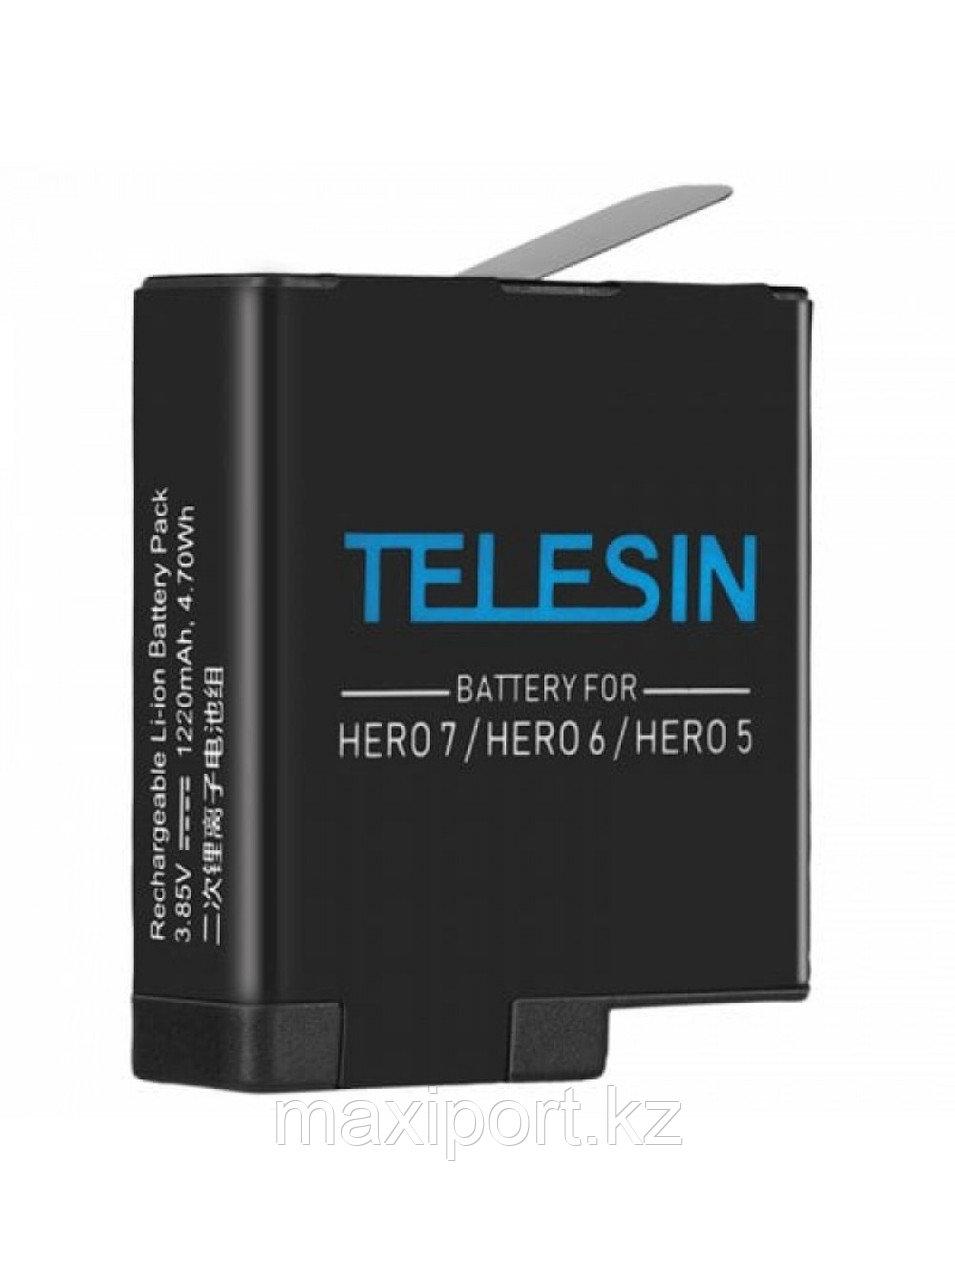 Аккумулятор TELESIN для GoPro Hero 5/6/7